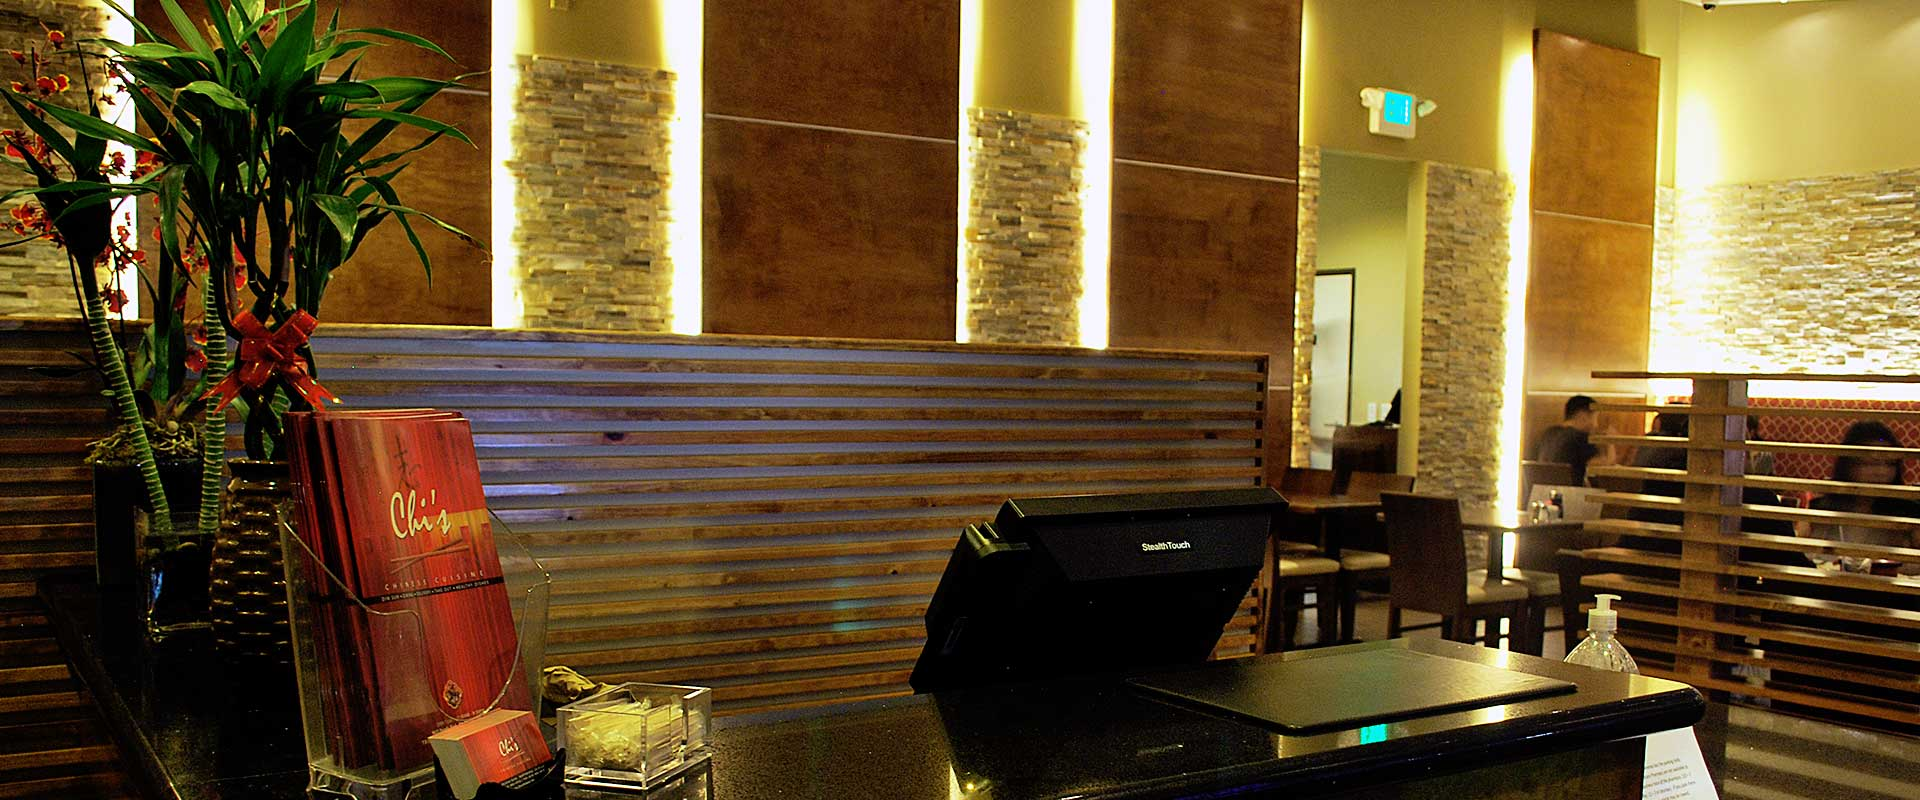 Chis_Restaurant2